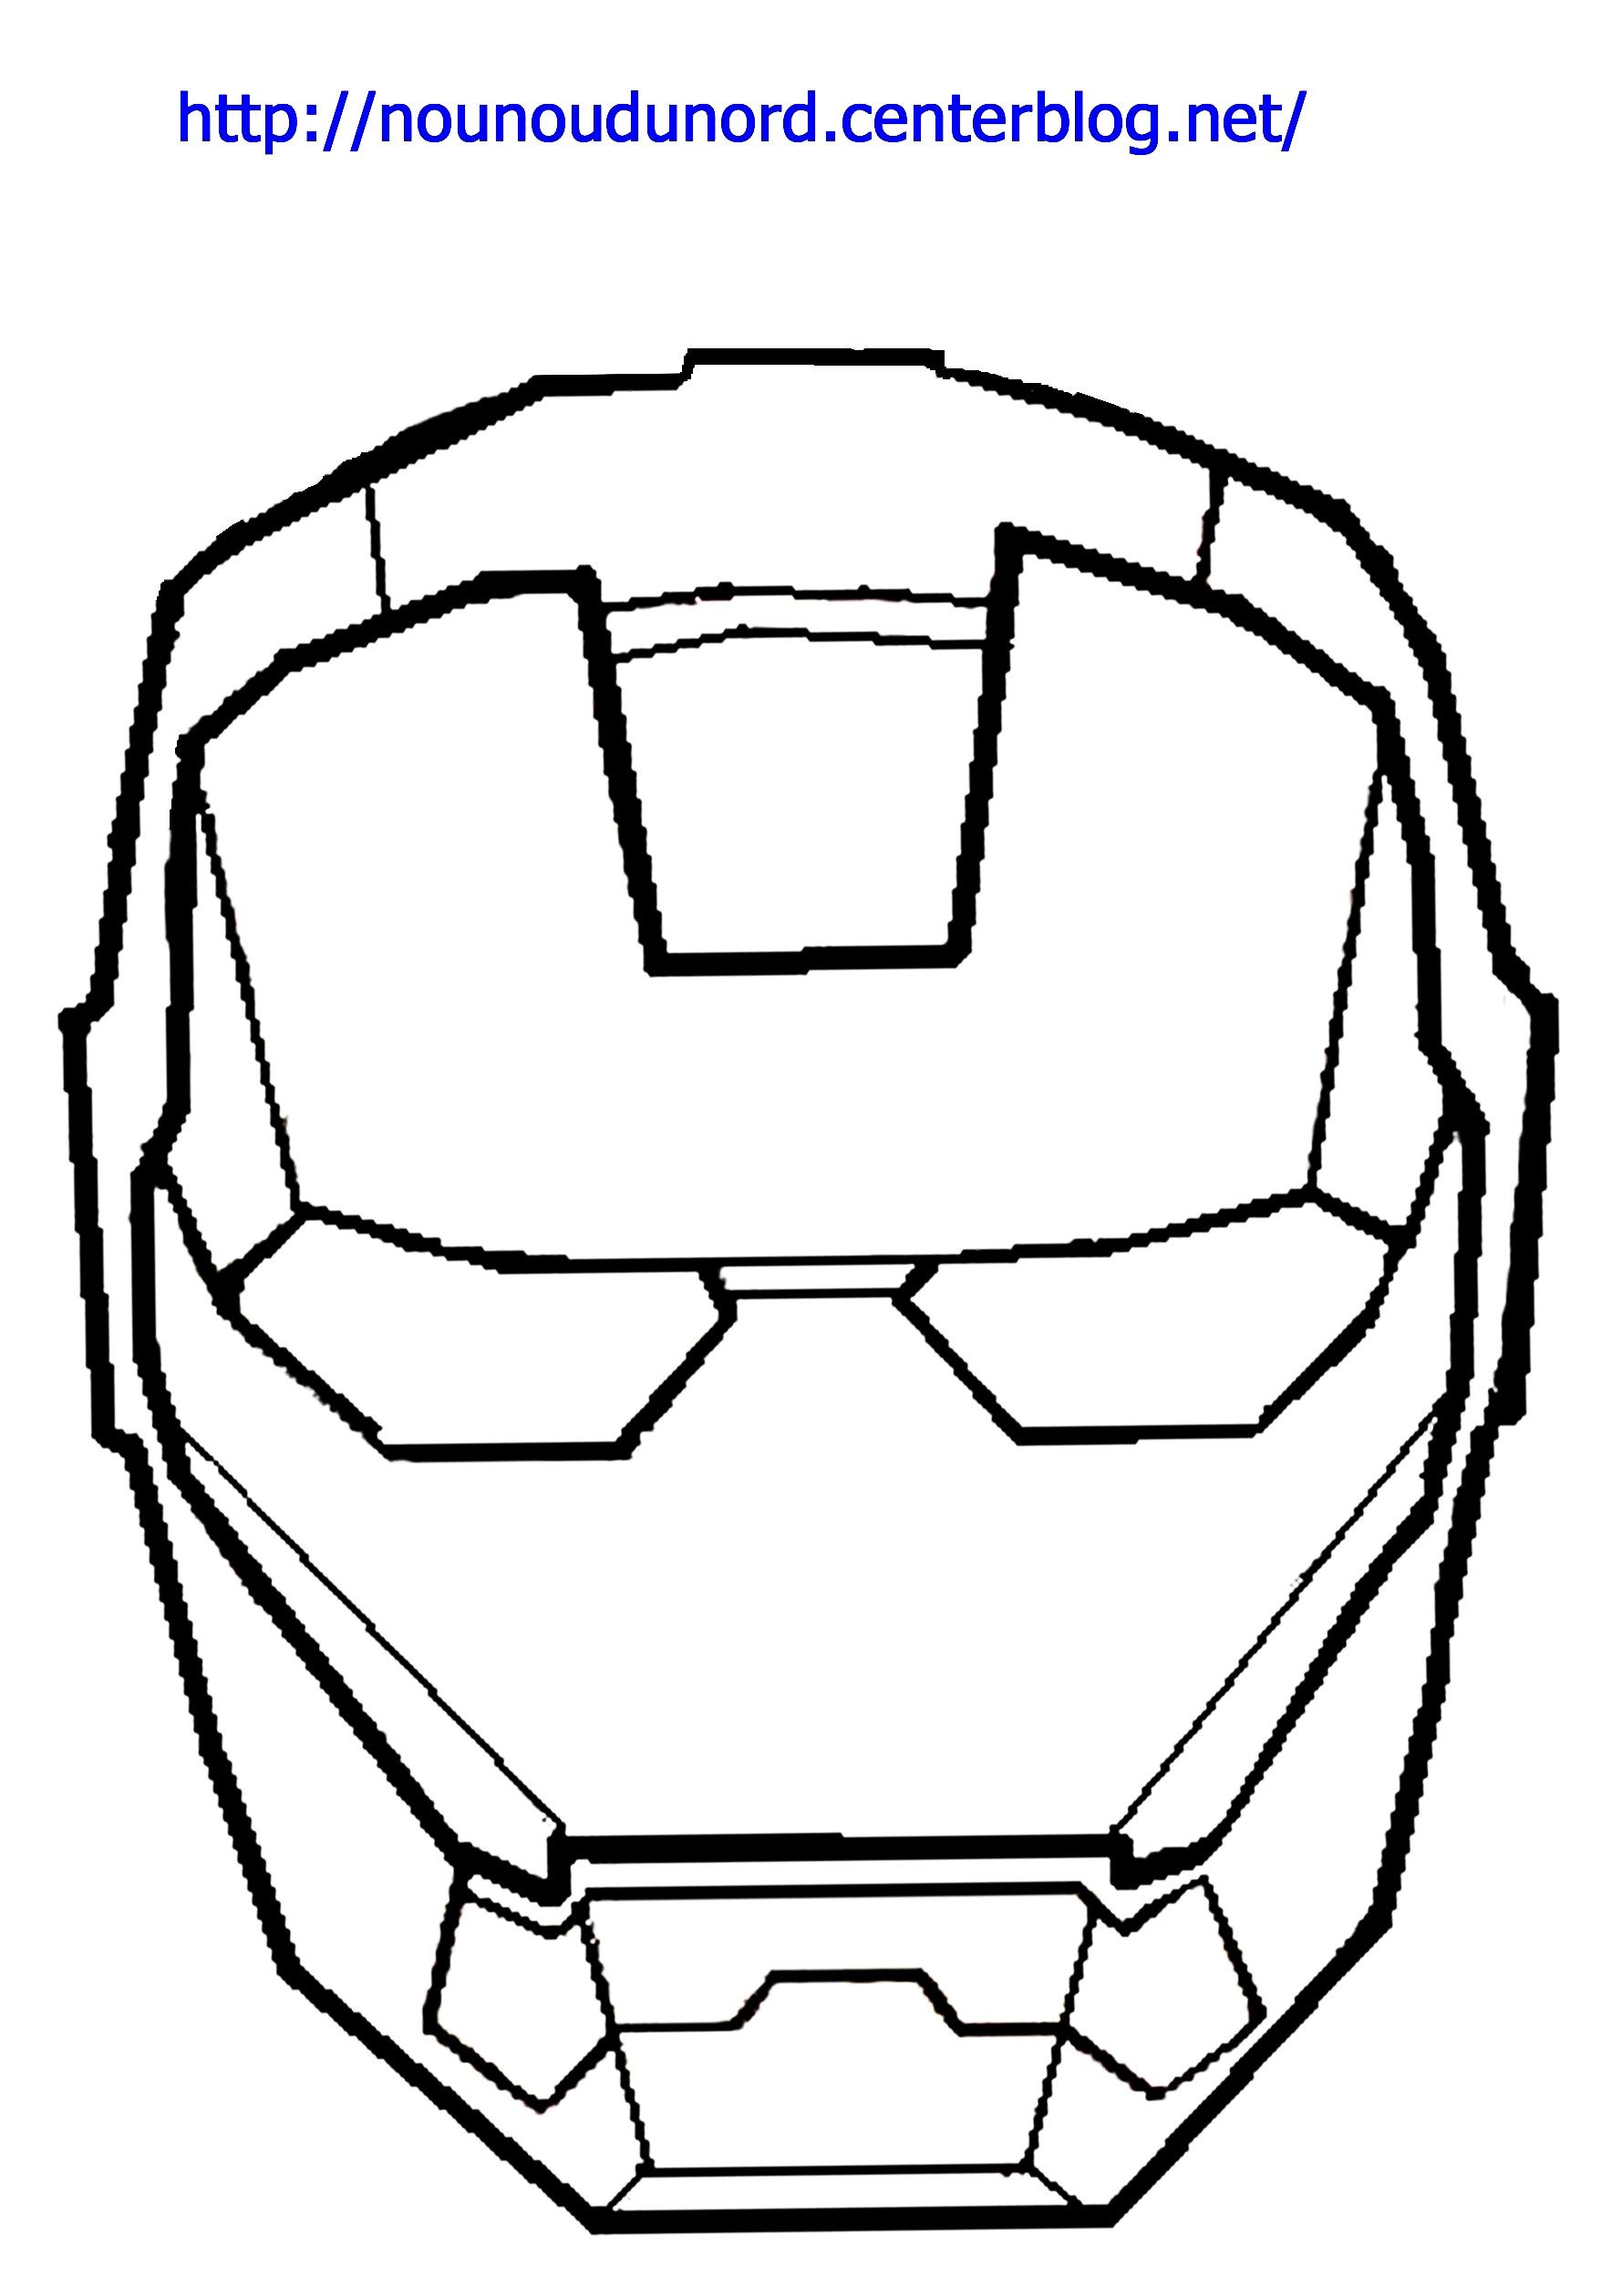 Coloriage iron man dessin par nounoudunord - Dessin avengers facile ...